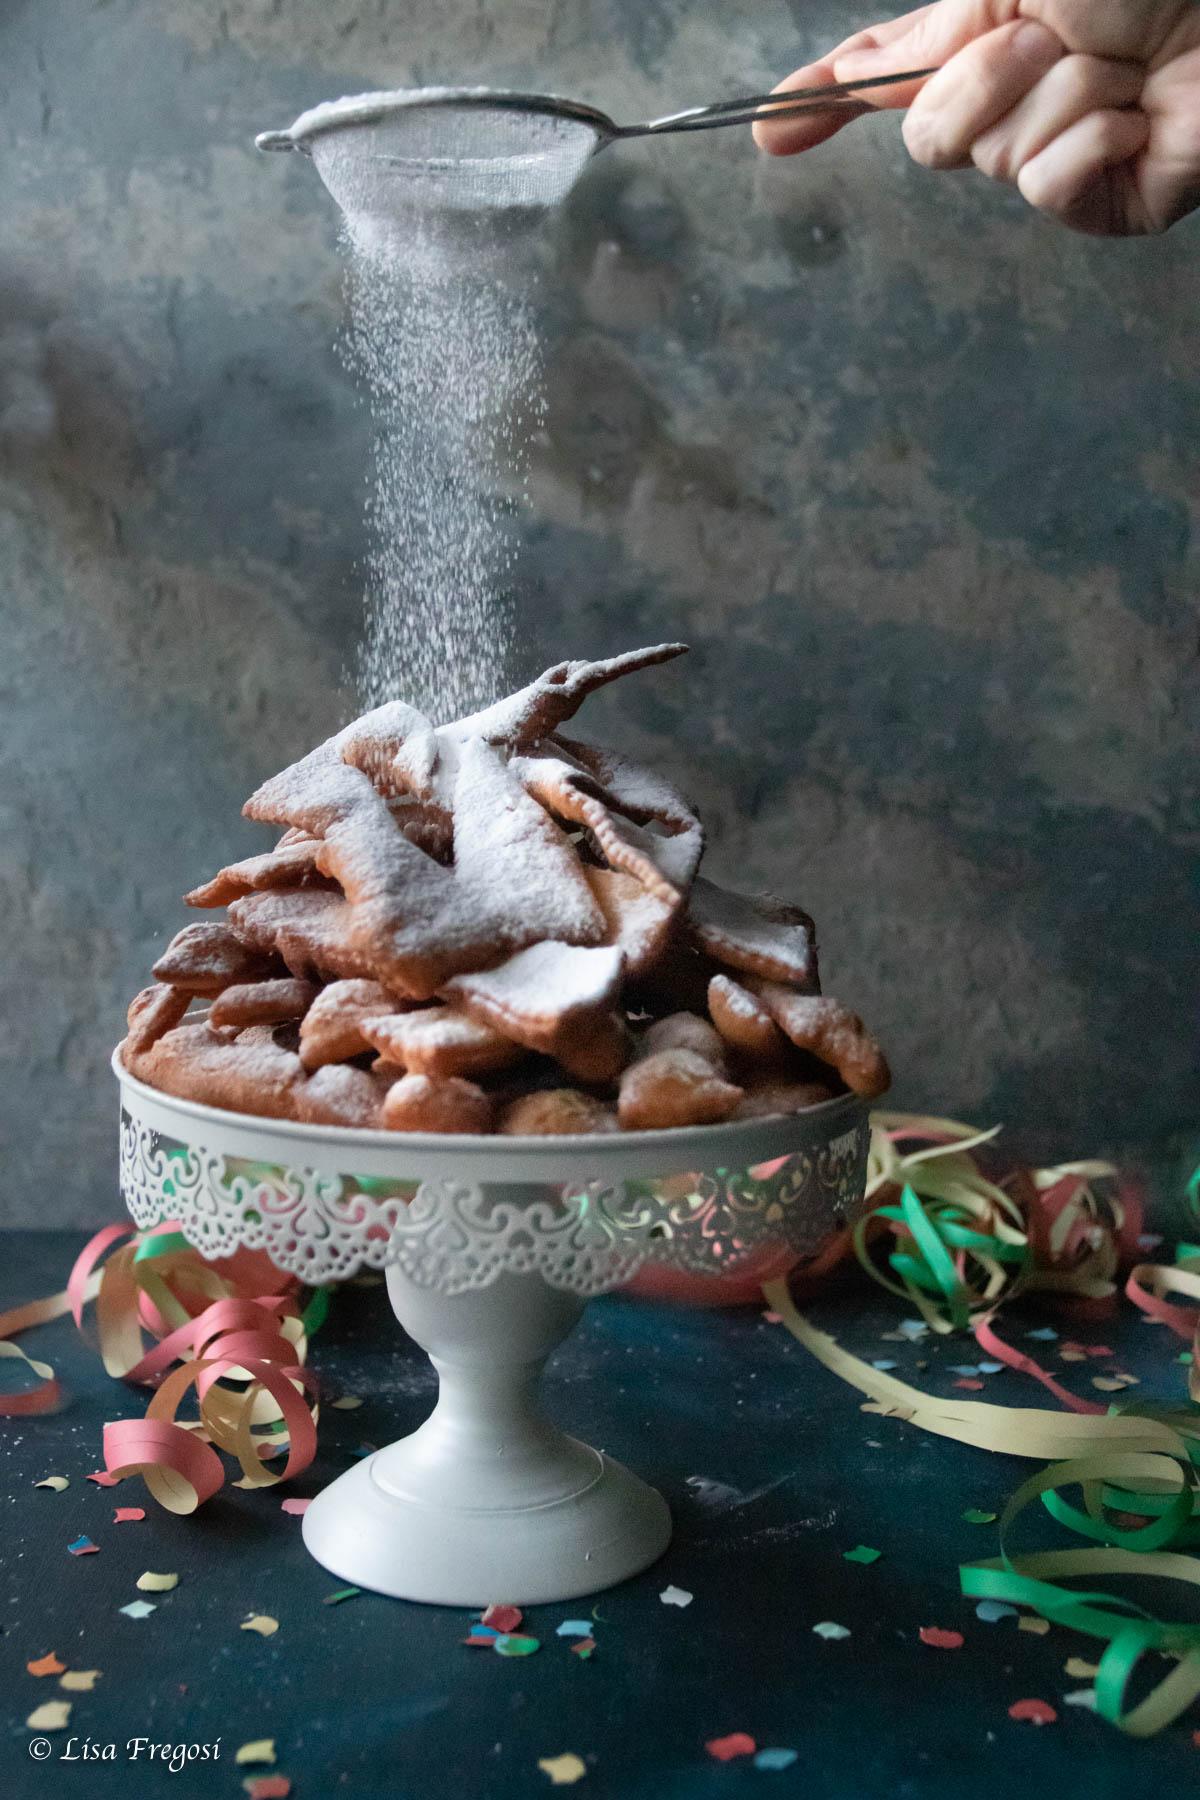 ingredienti chiacchiere fritteingredienti chiacchiere fritte